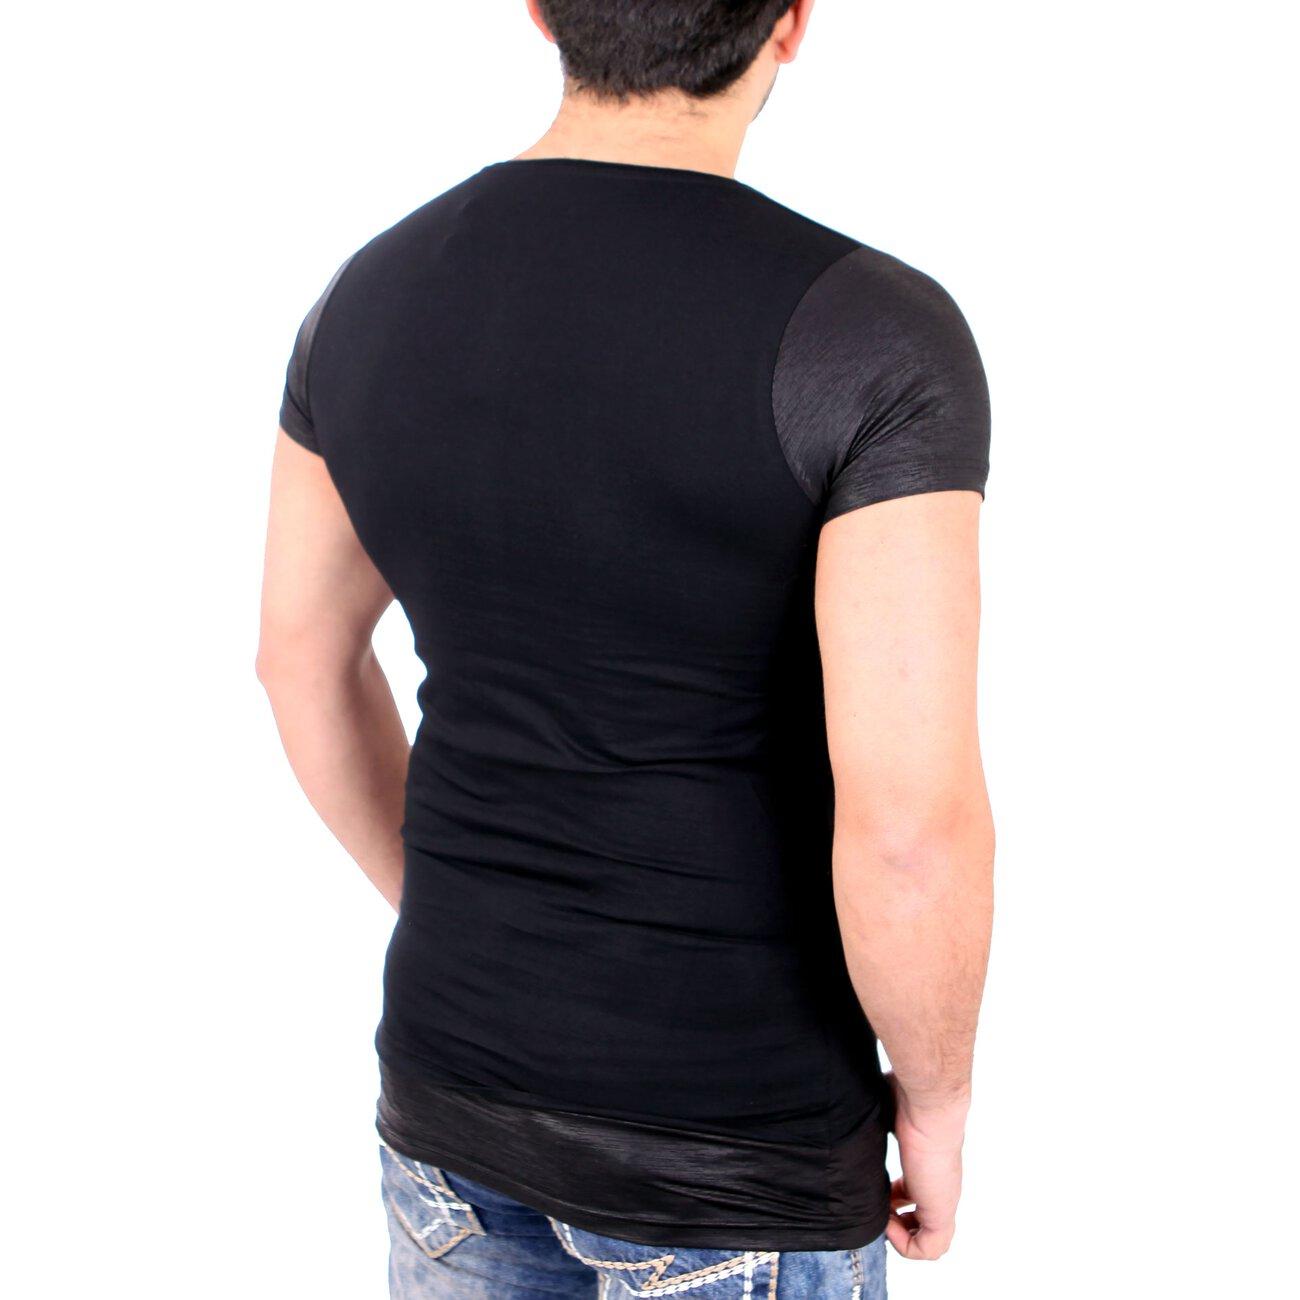 carisma t shirt herren slim fit oversize totenkopf print shirt crsm 4. Black Bedroom Furniture Sets. Home Design Ideas